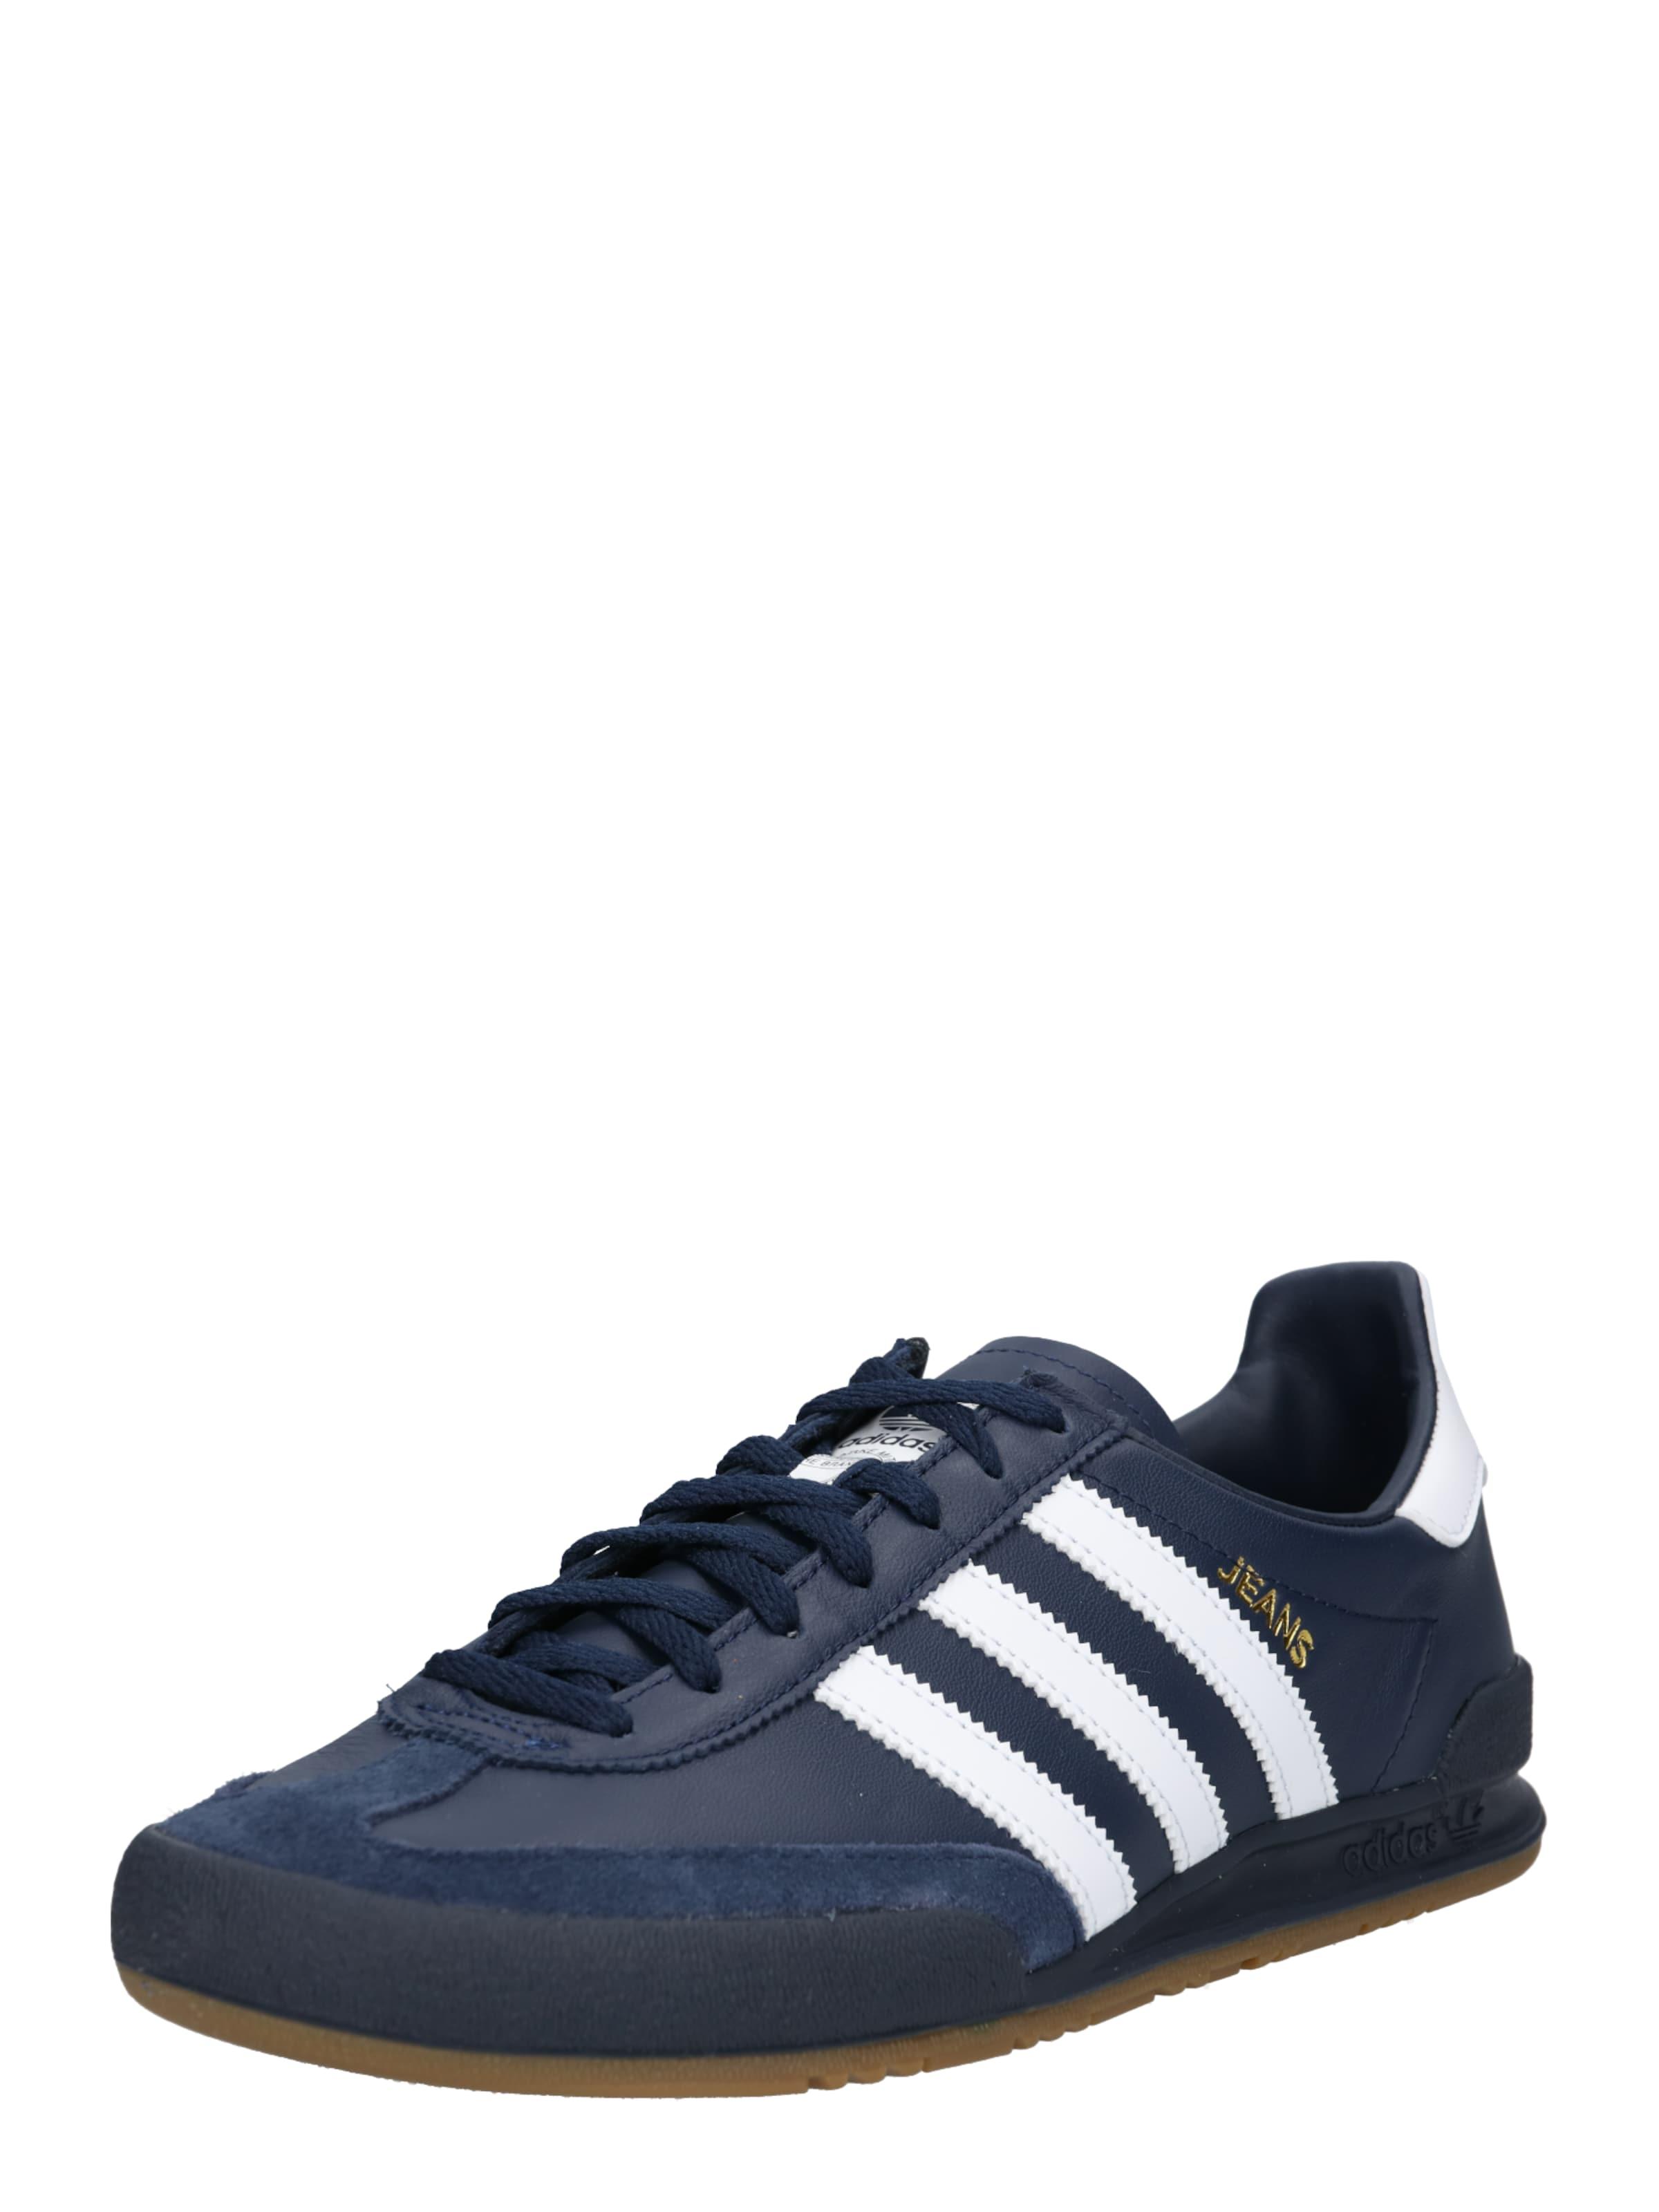 'jeans' Originals NachtblauWeiß In Sneaker Adidas xsCtdrhQ